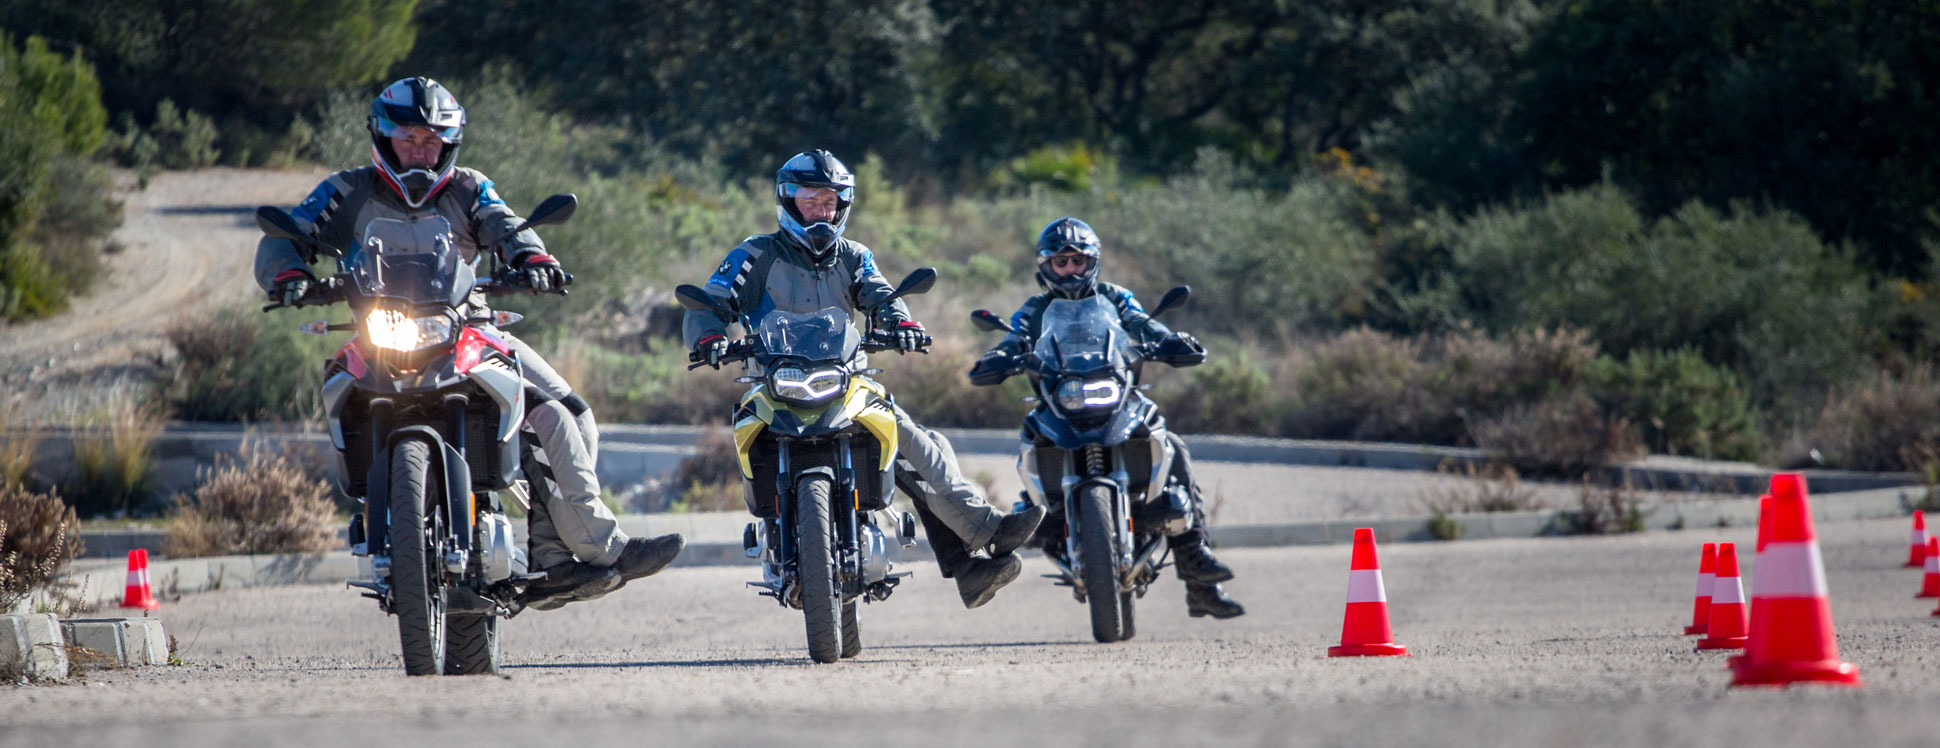 Motorraddatiing-Zertifikat